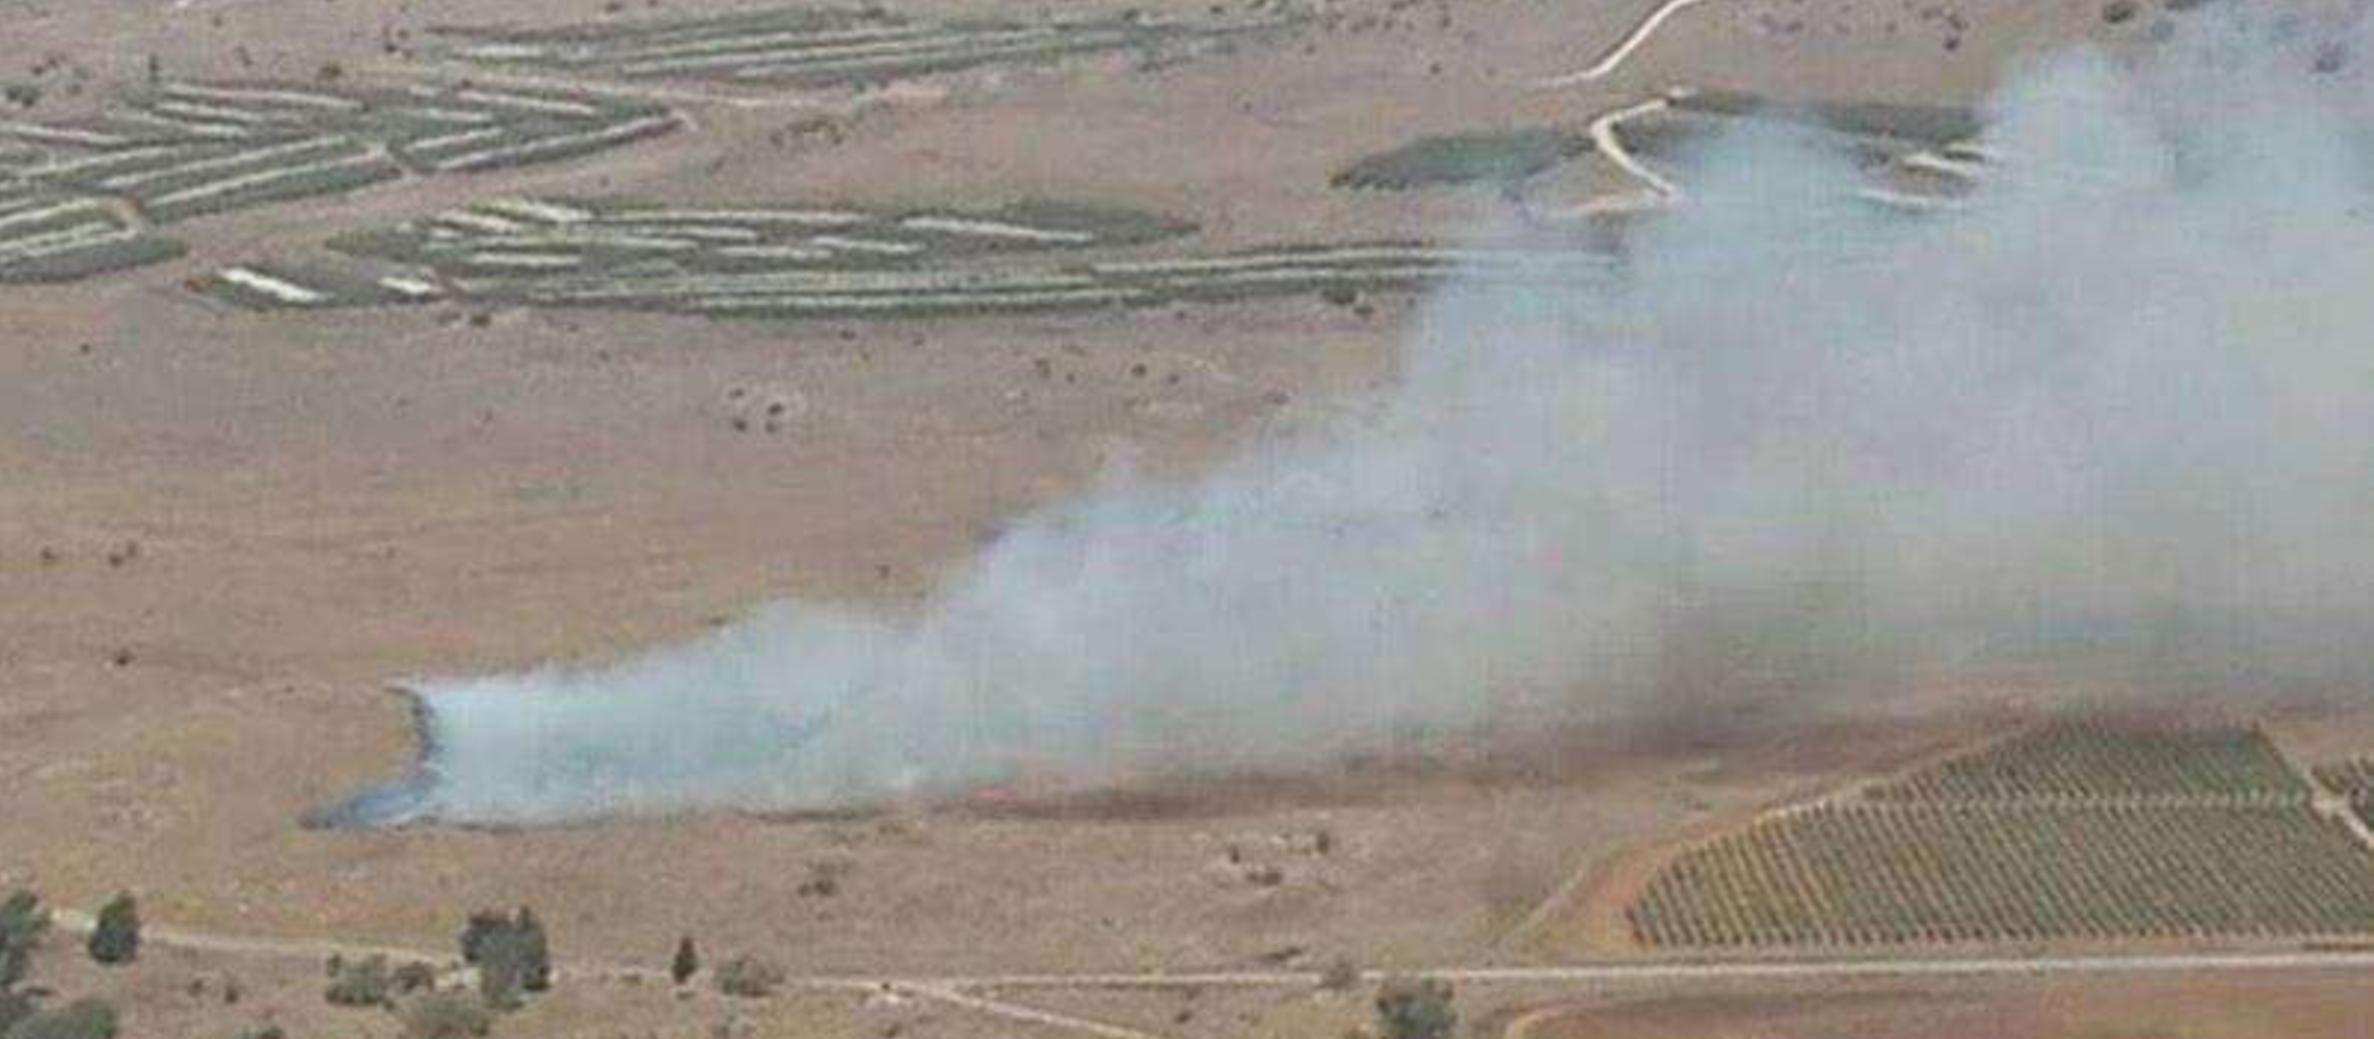 Syrian civil war intensifying at Israel's border – more mortar shells land in Israel